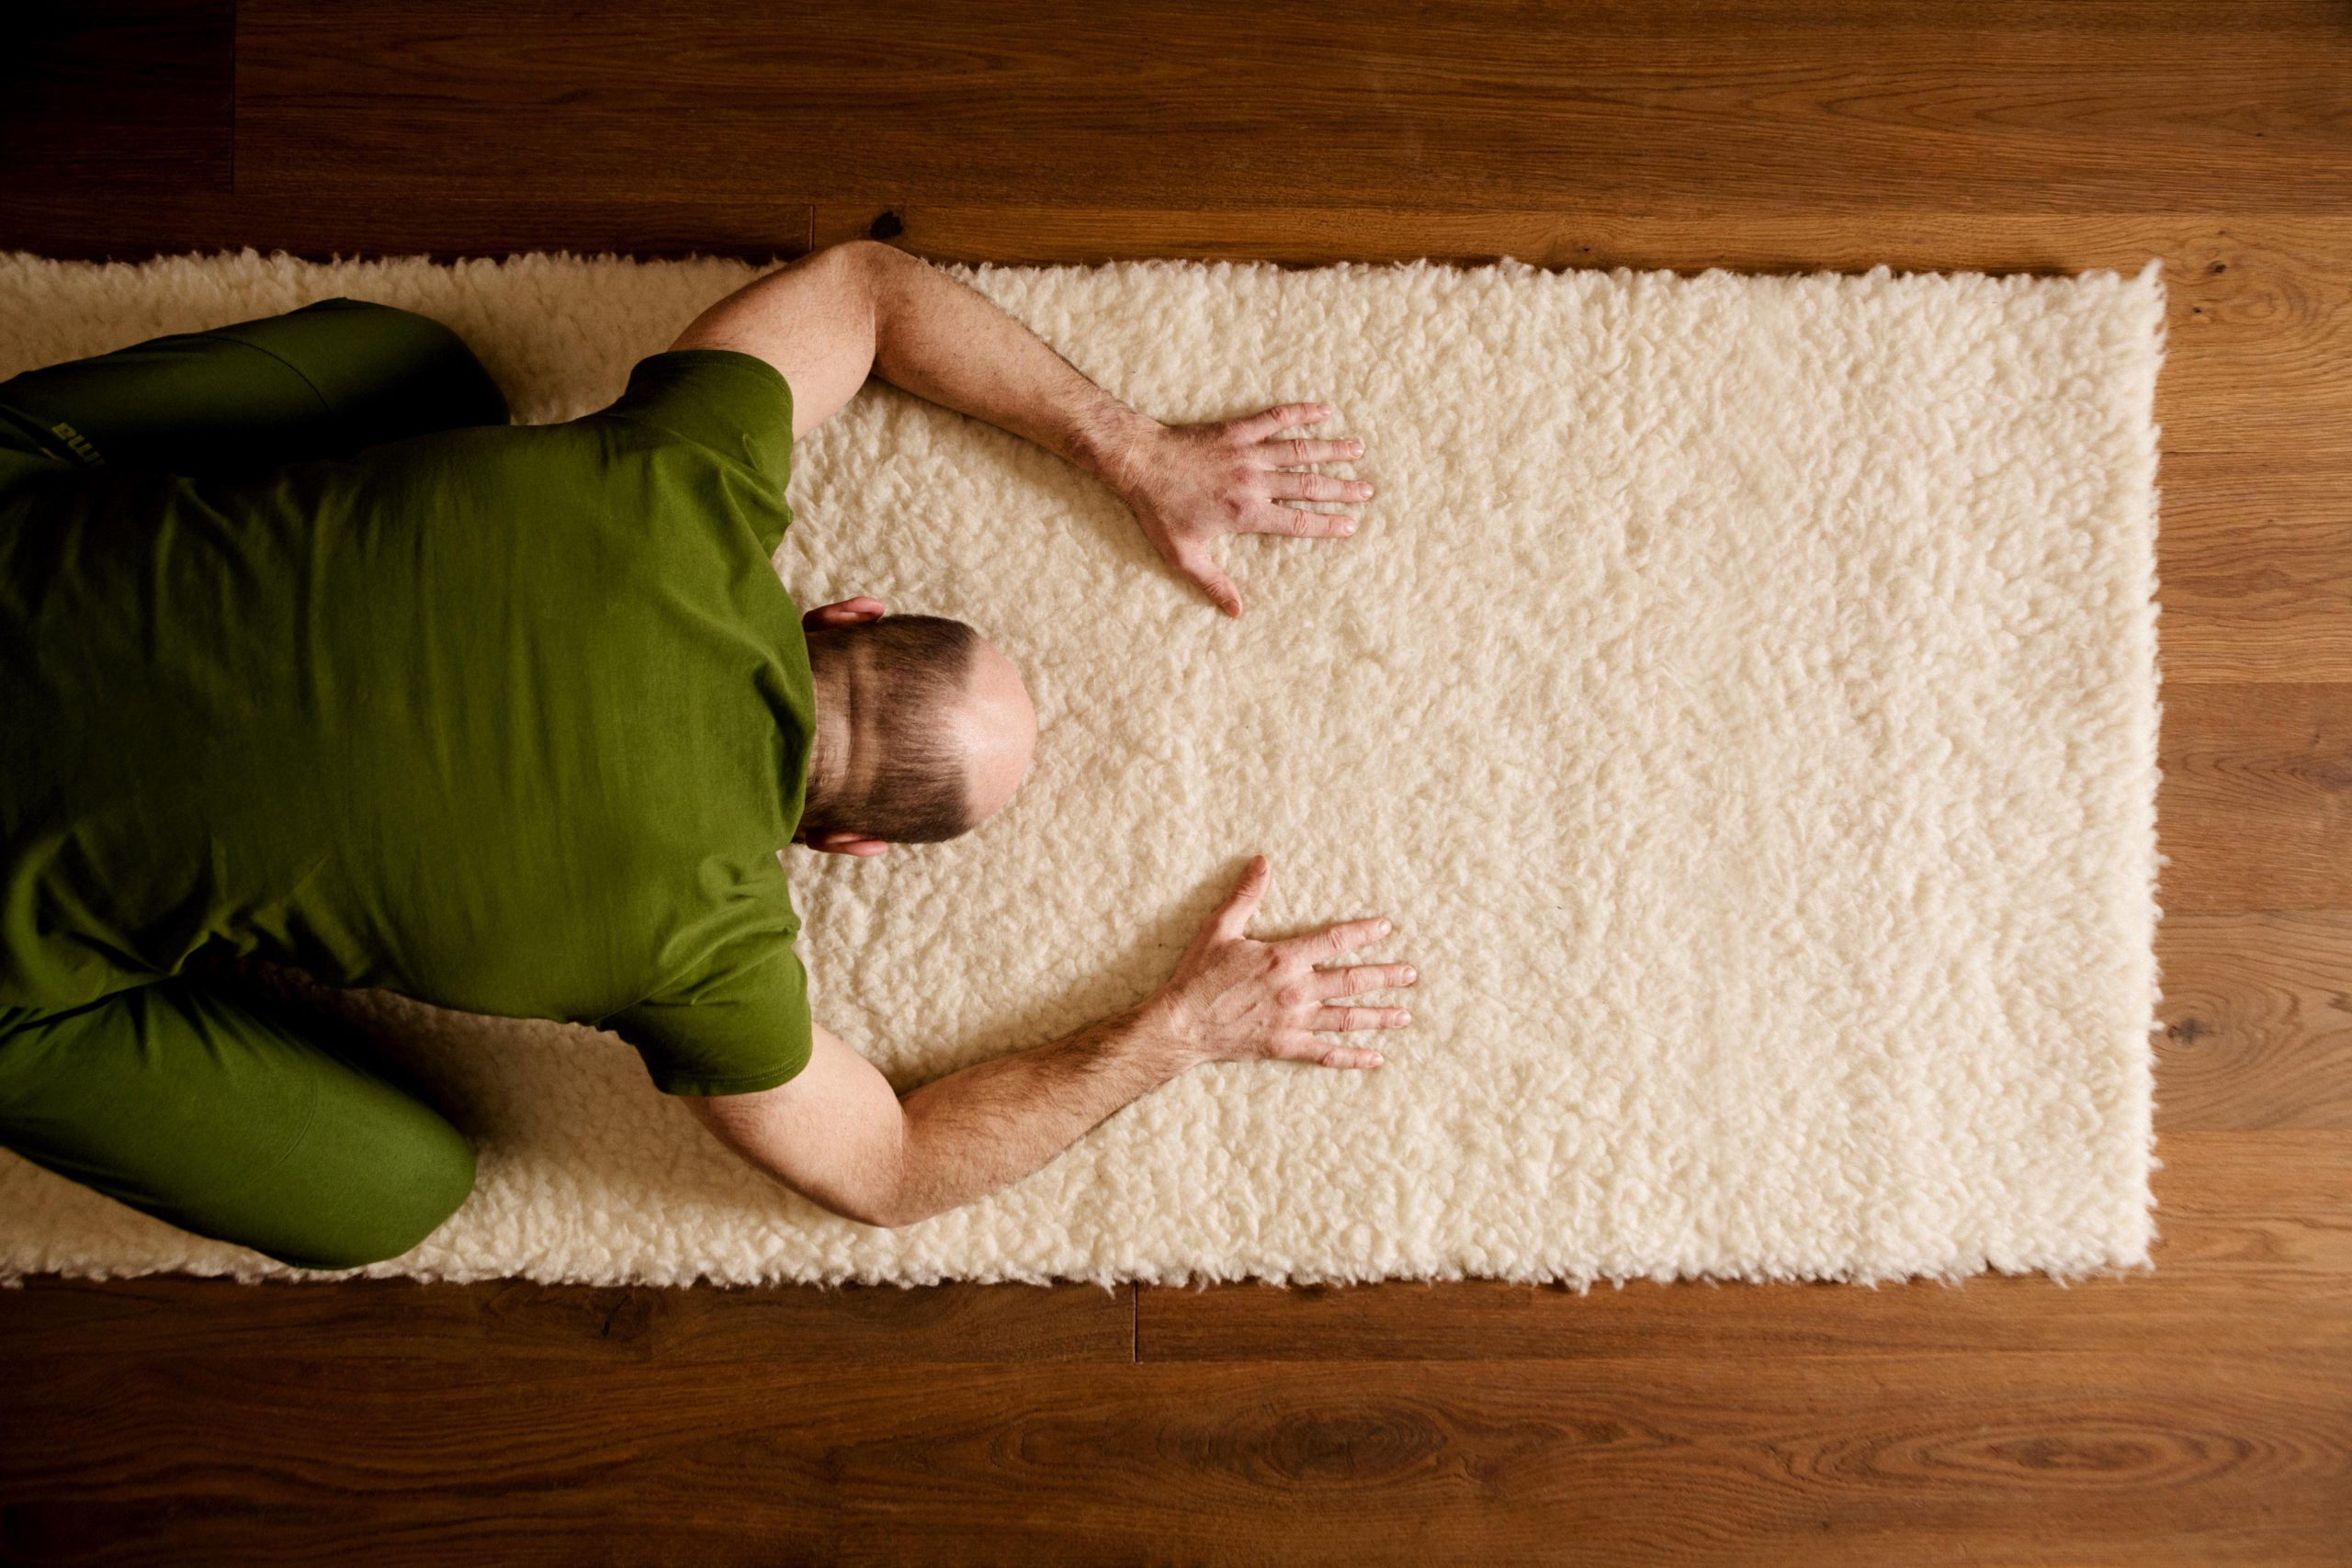 yogafotografie businessfotografie yoga fotografie